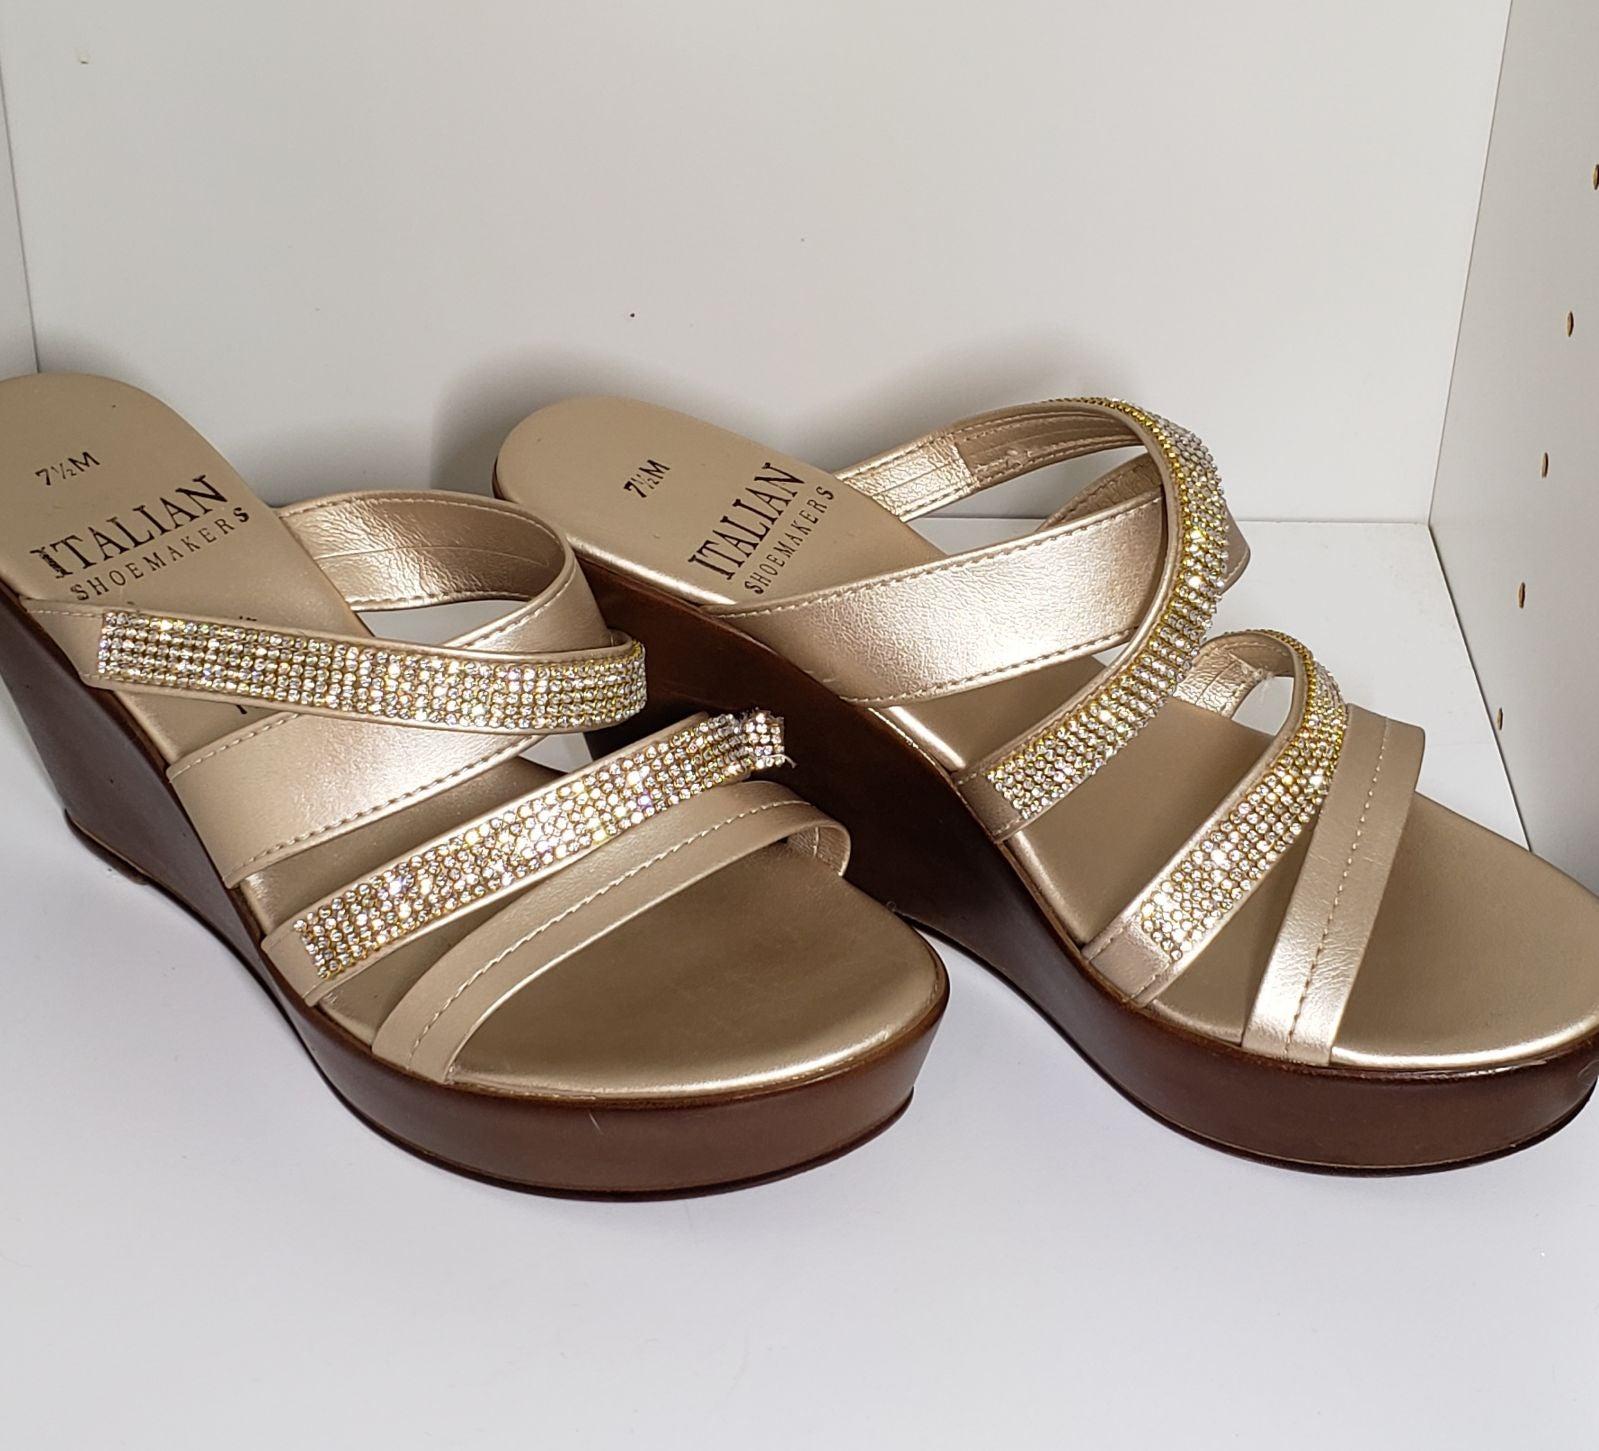 Italian Shoemaker Embellished Sandals